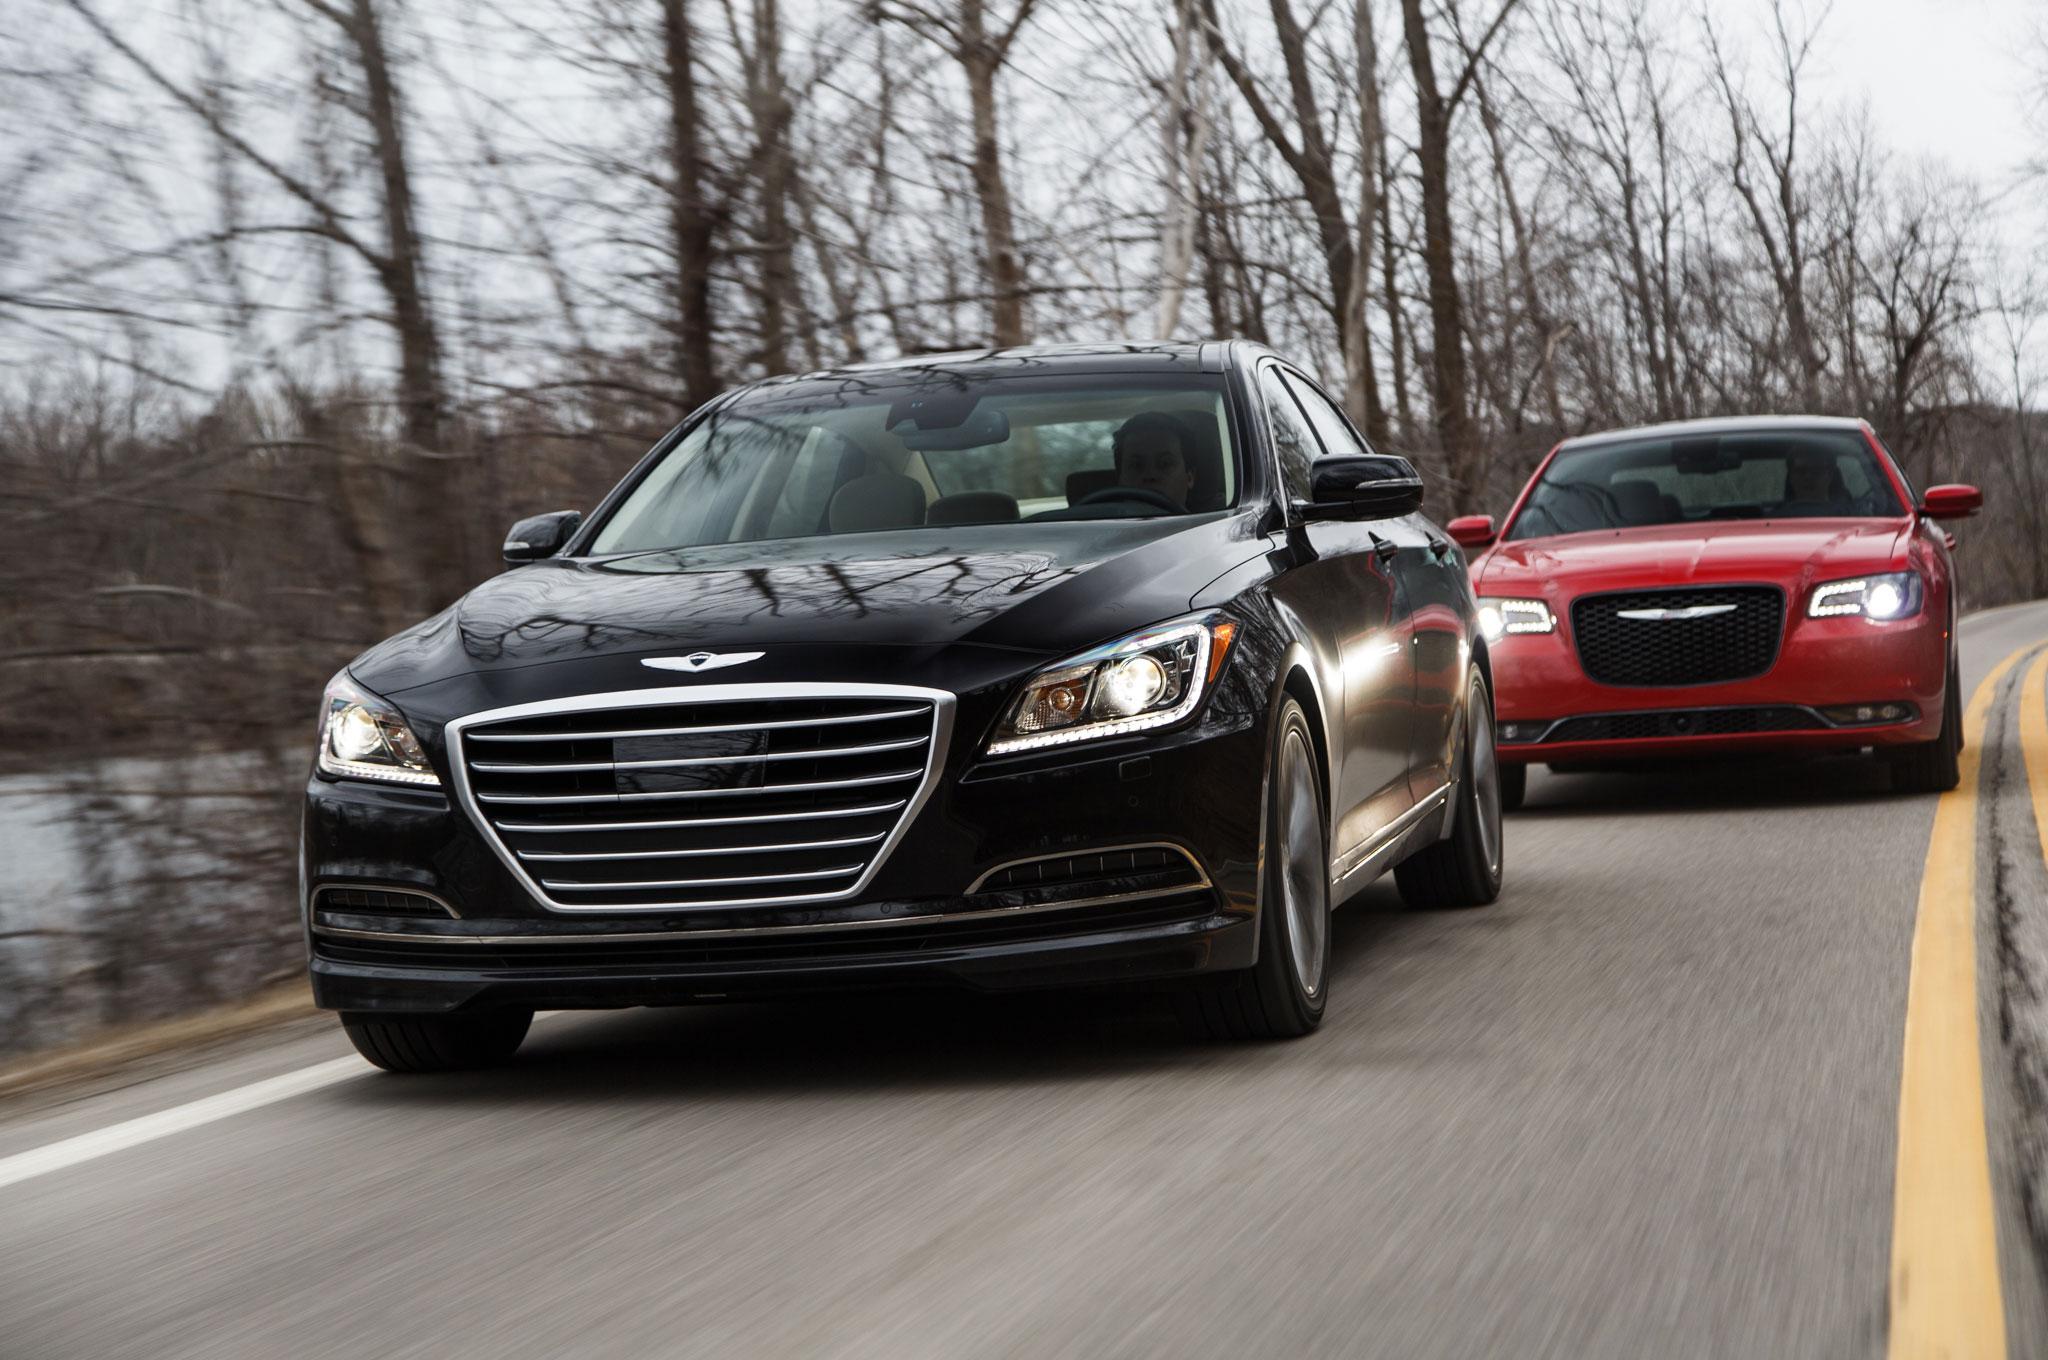 2015 Chrysler 300 Vs 2015 Hyundai Genesis Comparison